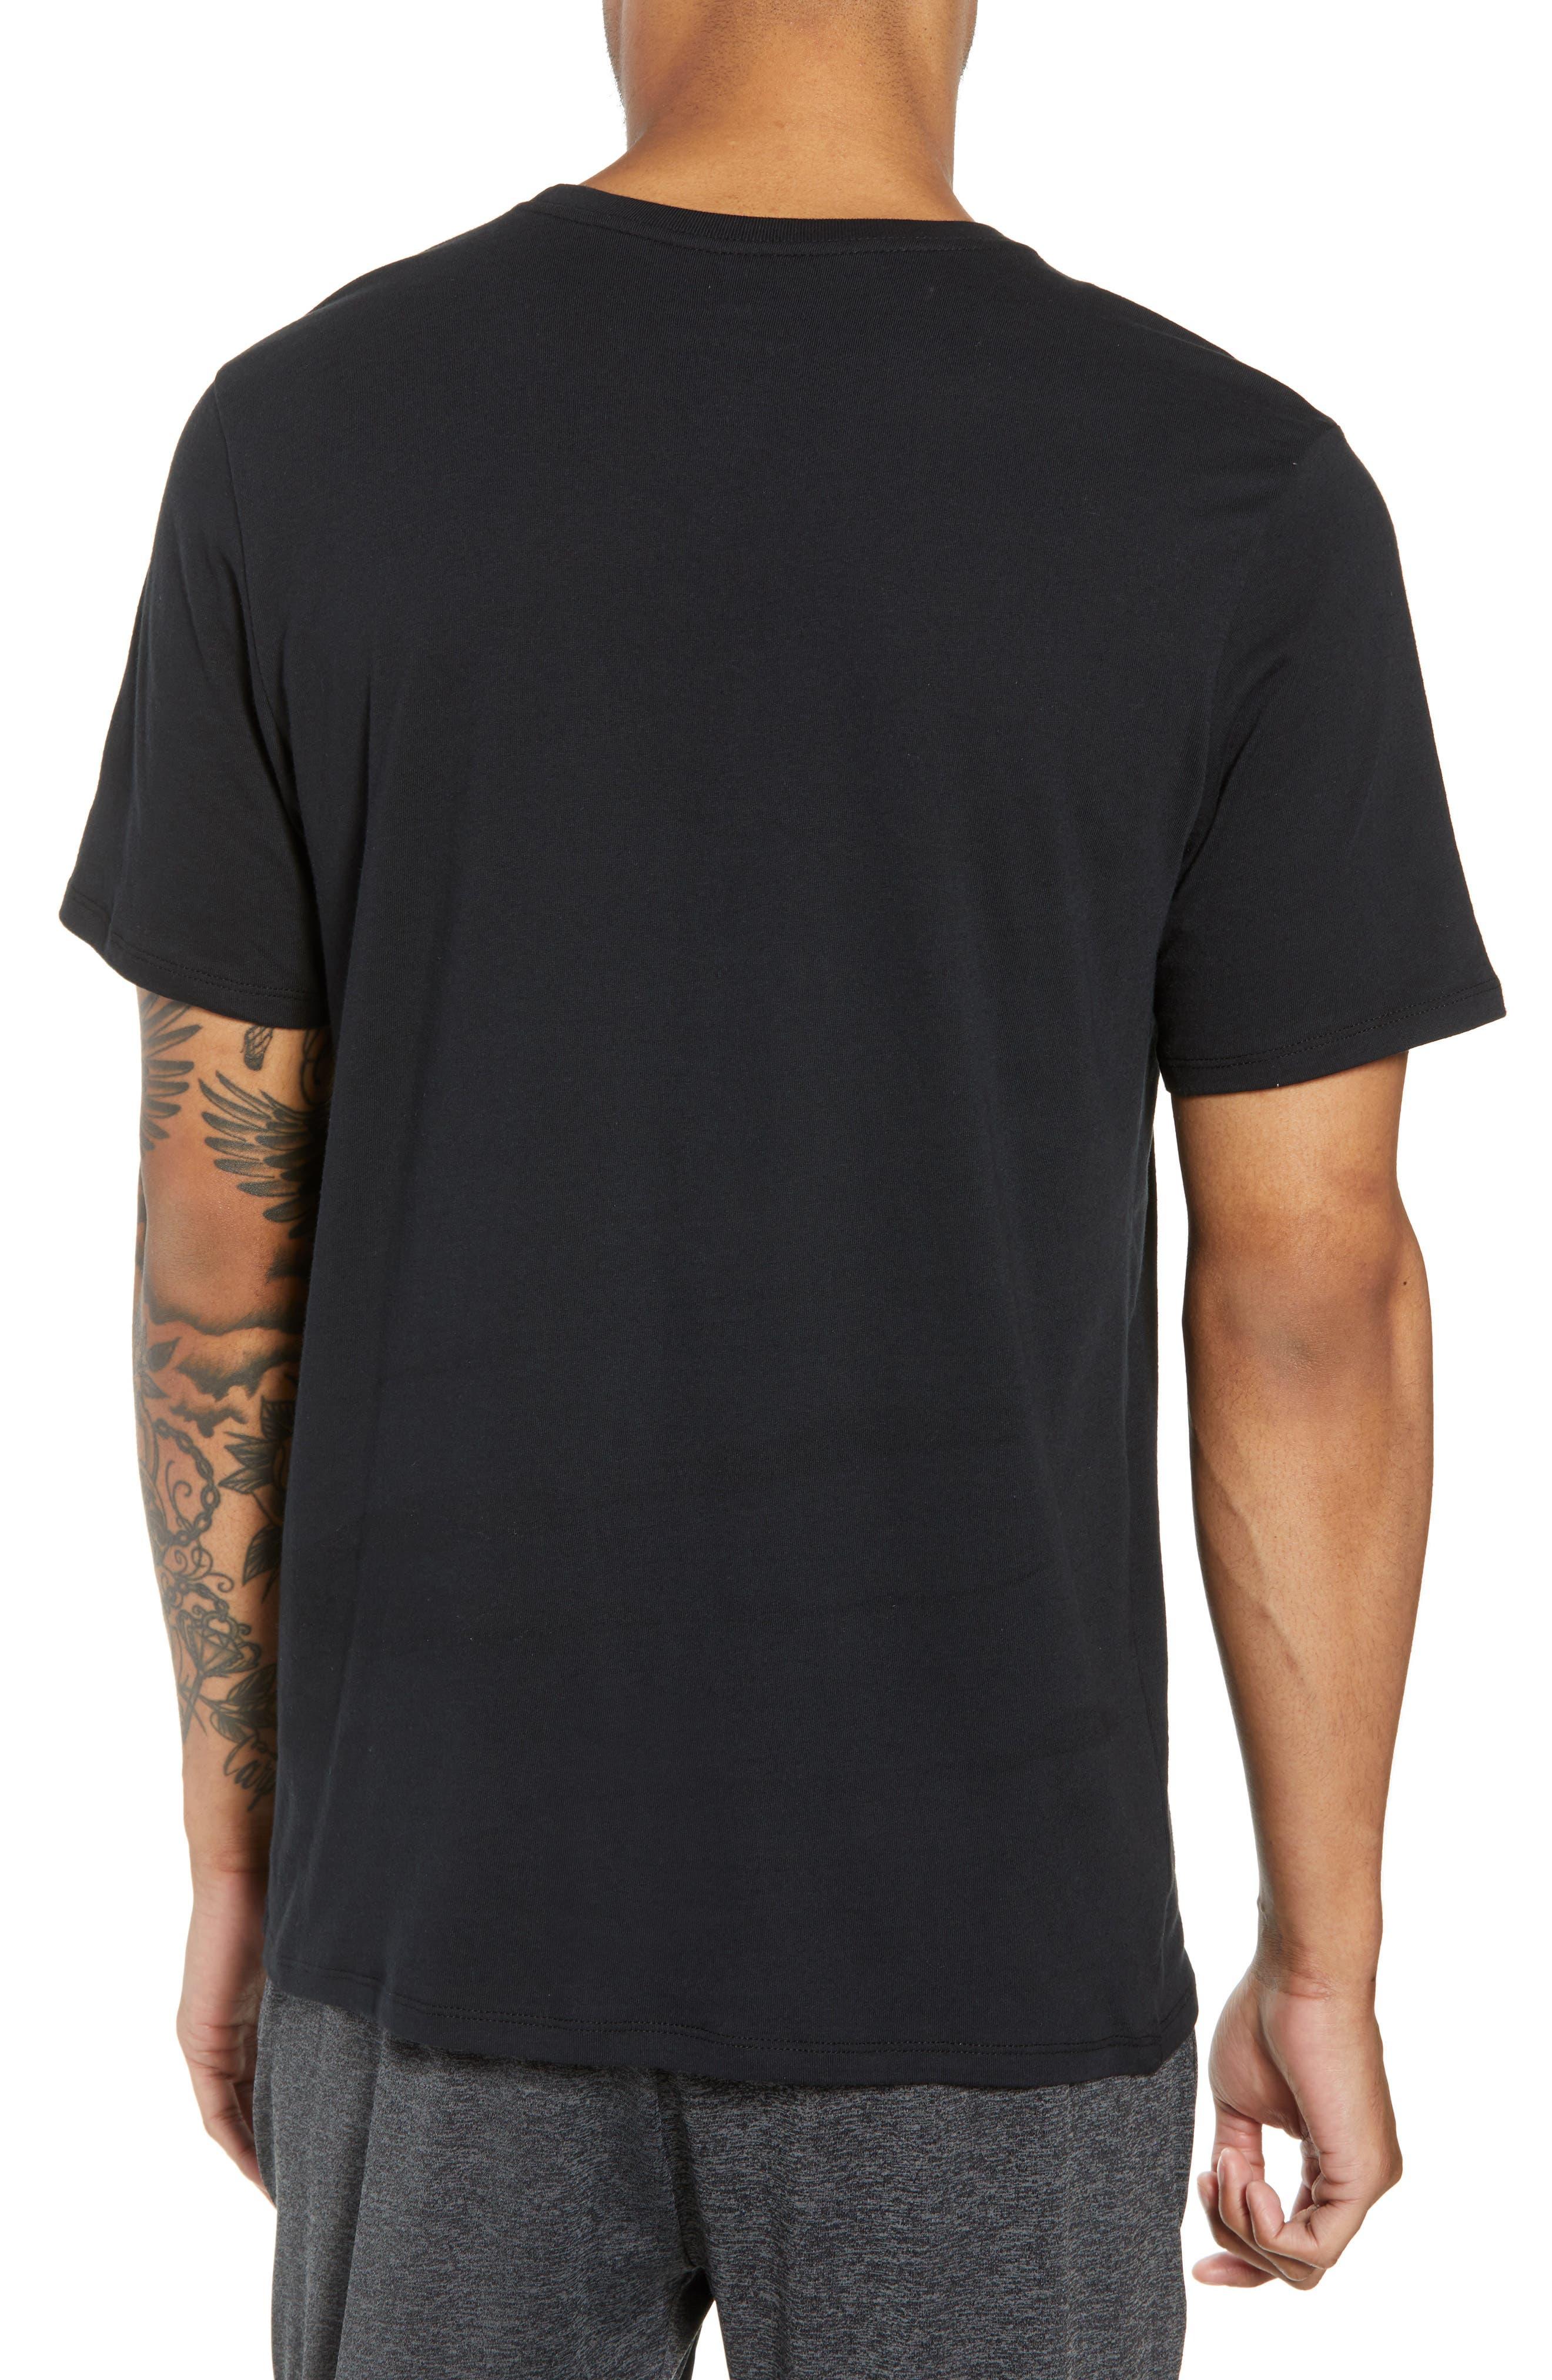 NSW Air 3 Crewneck T-Shirt,                             Alternate thumbnail 2, color,                             BLACK/ WHITE